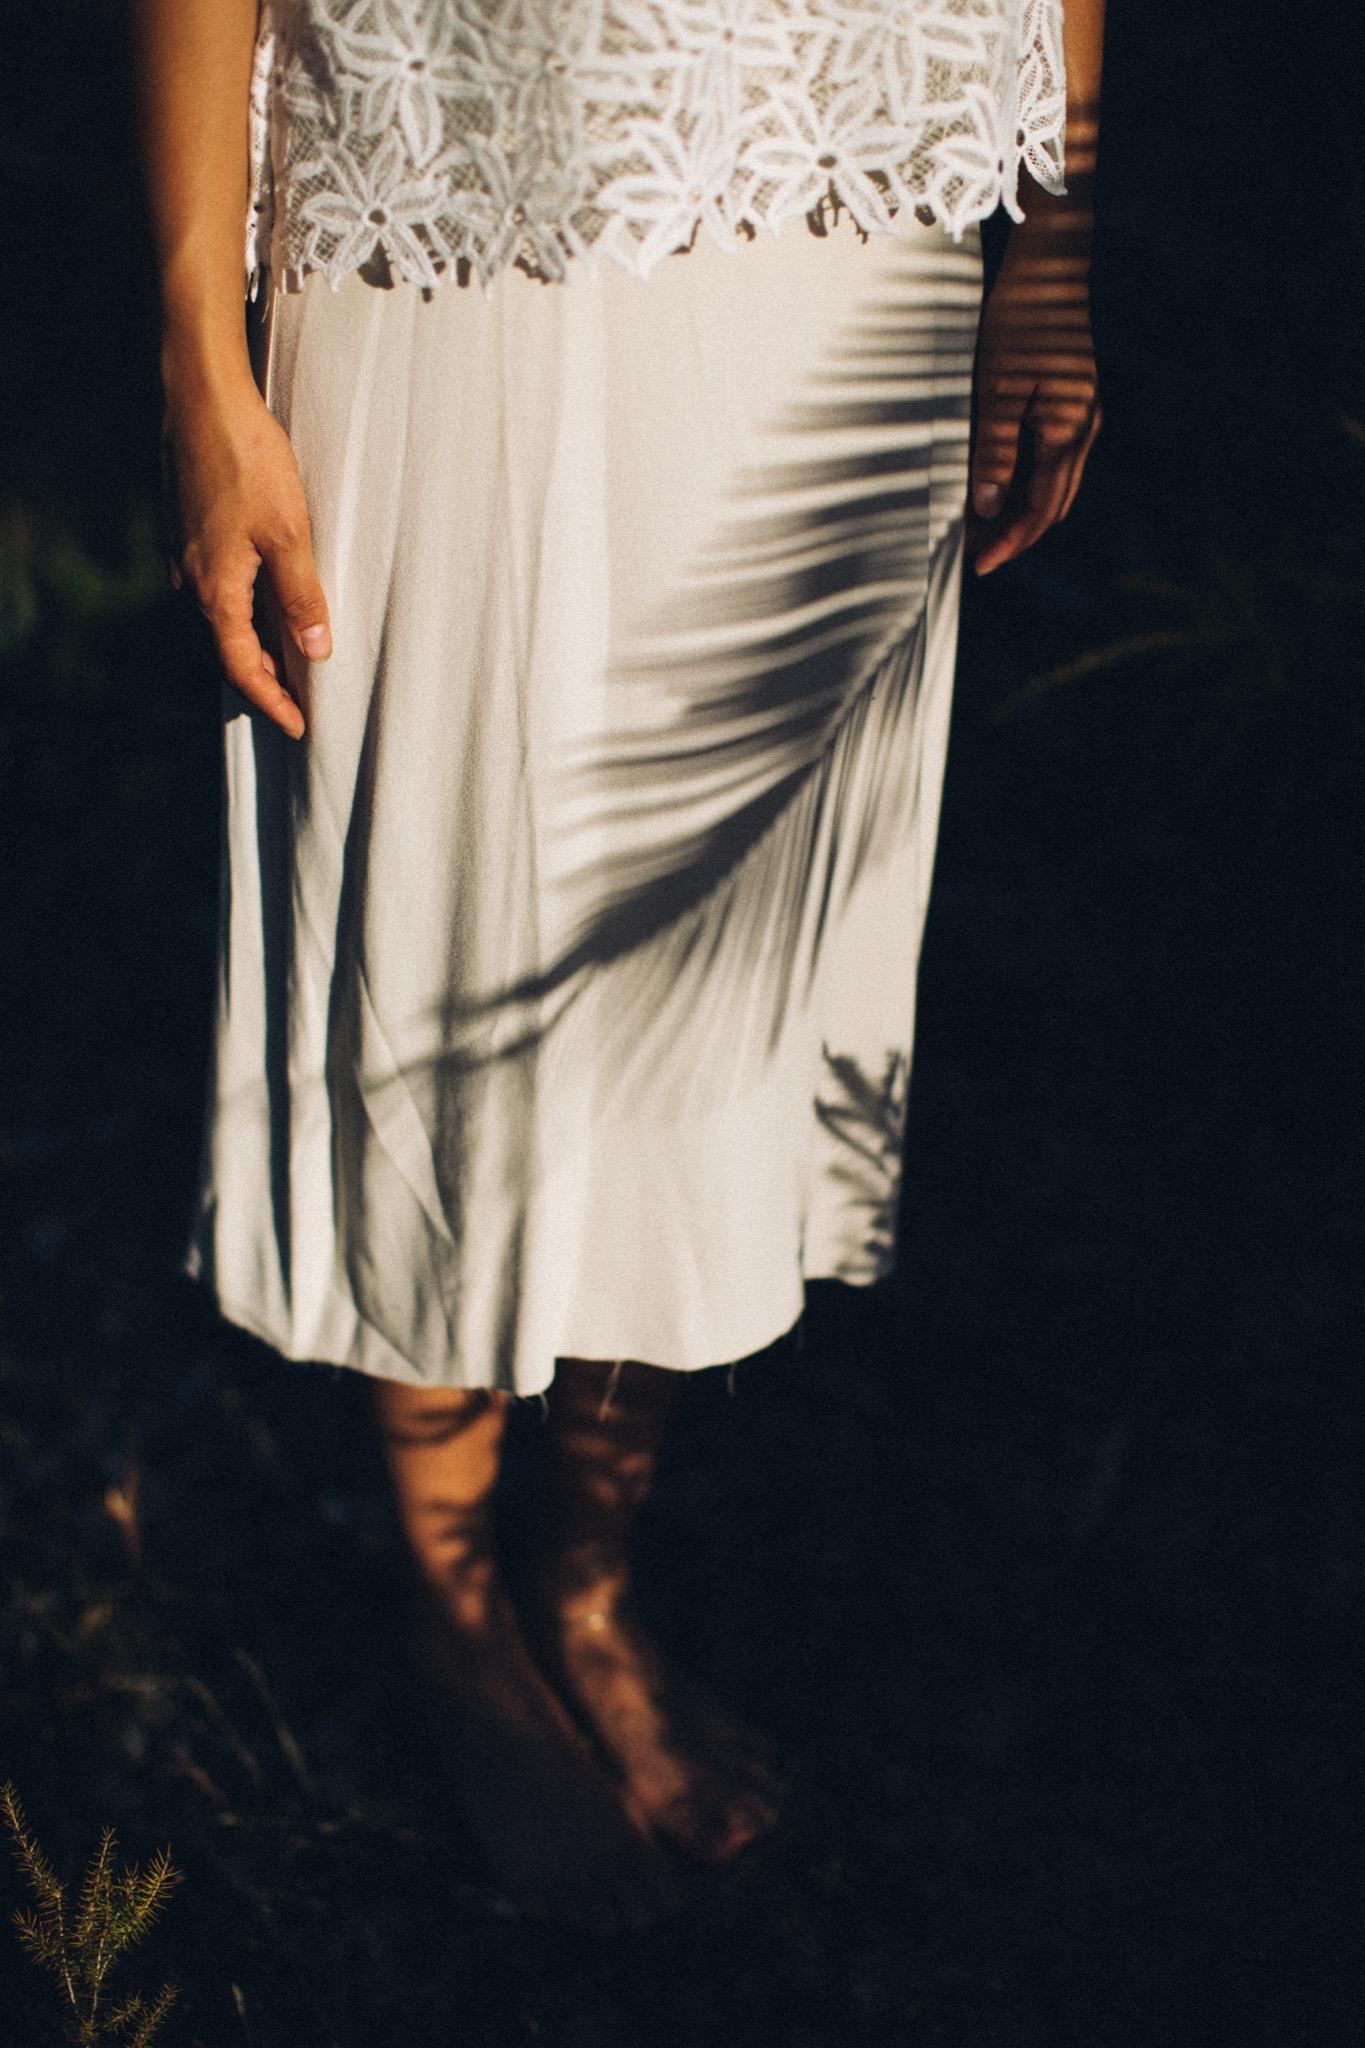 Mary Wears   Stevie May Daisy Chain Top + Commoners Silk Slip Dress